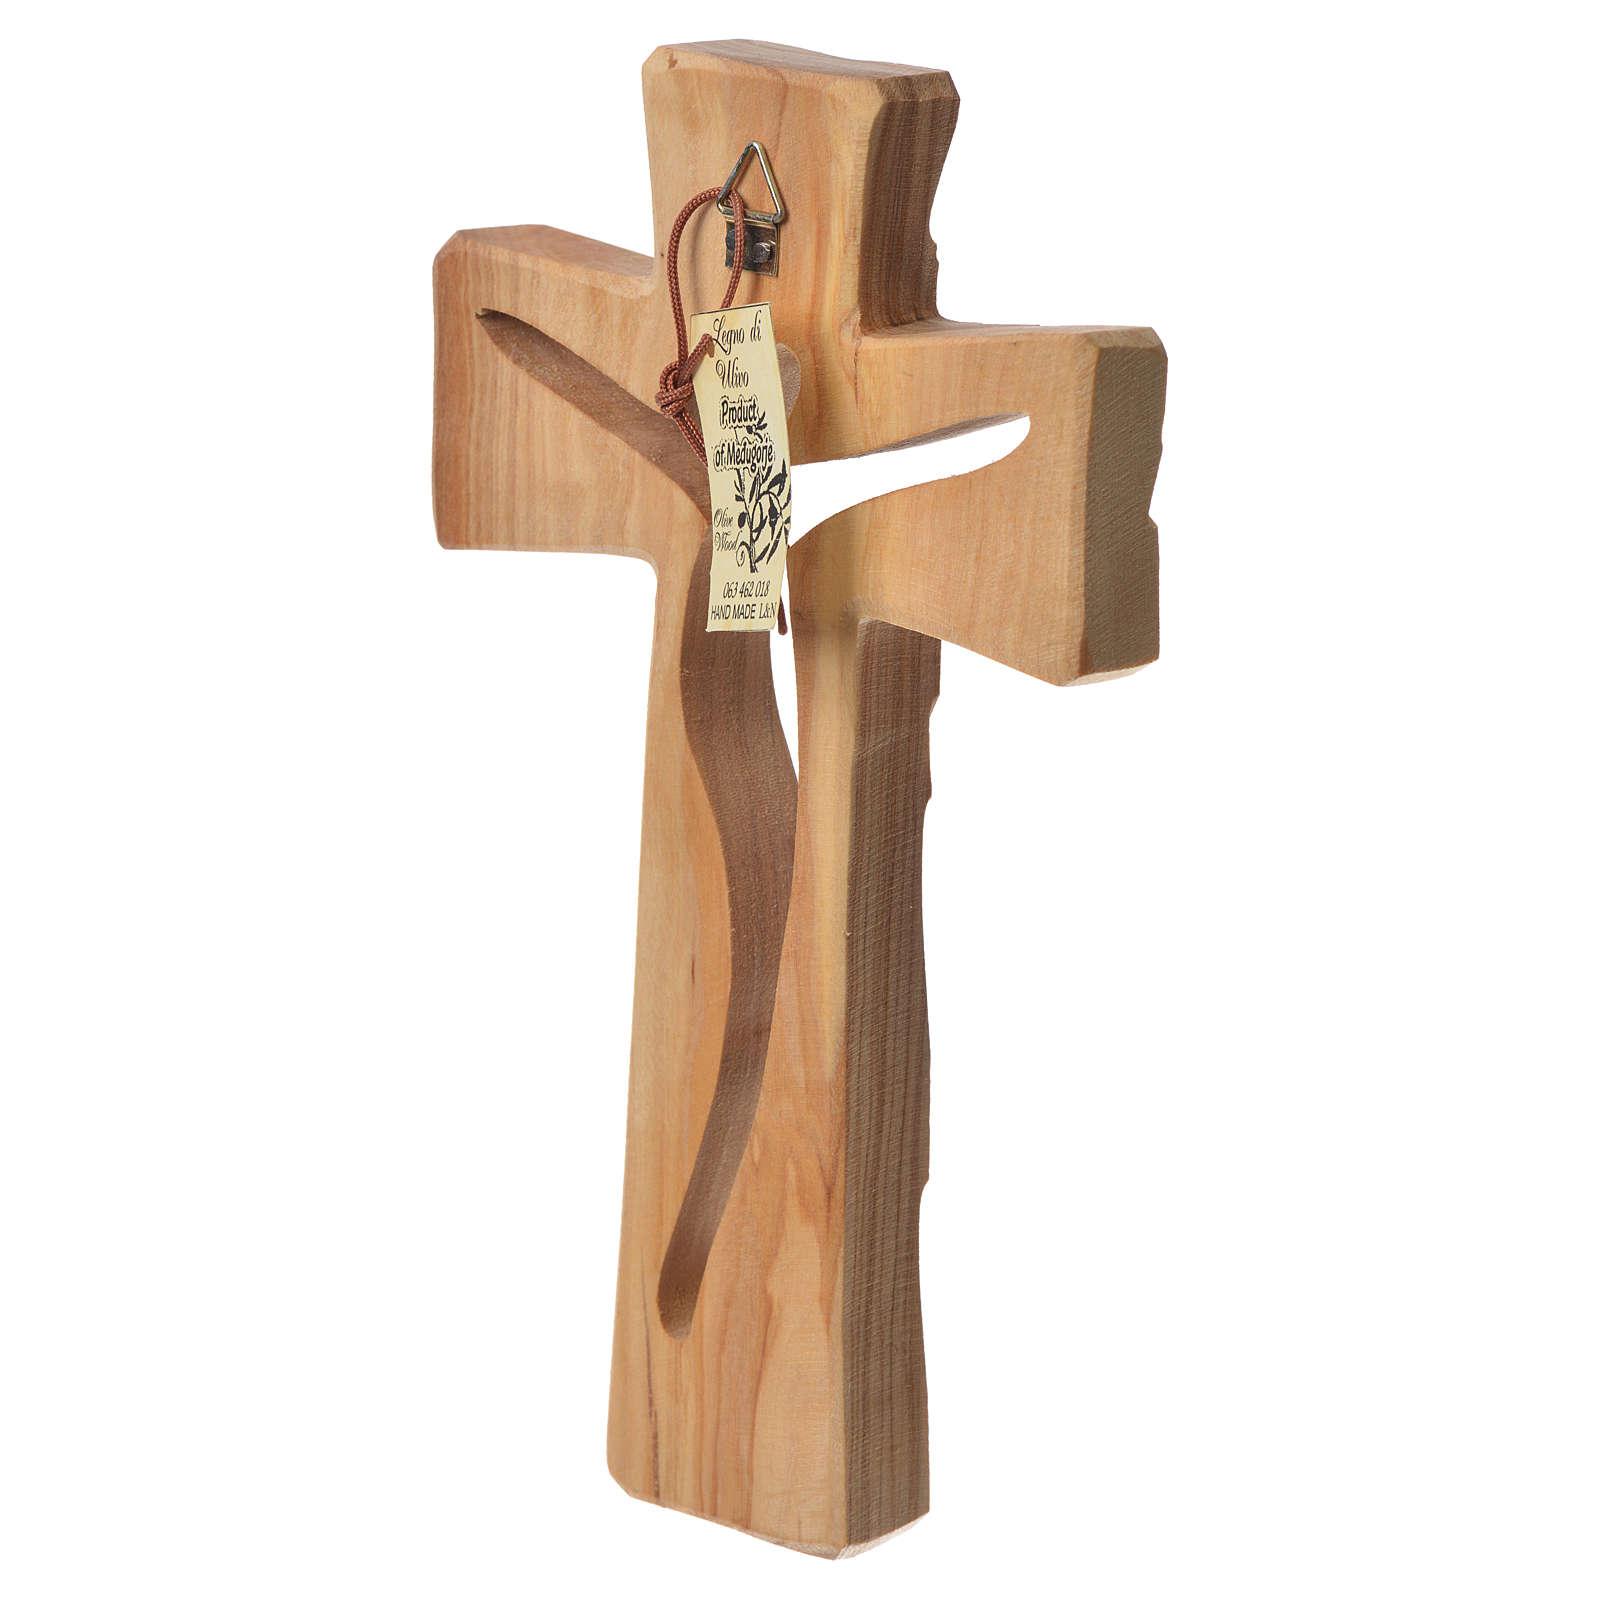 Medjugorje Cross in olive wood measuring 19x11cm 4